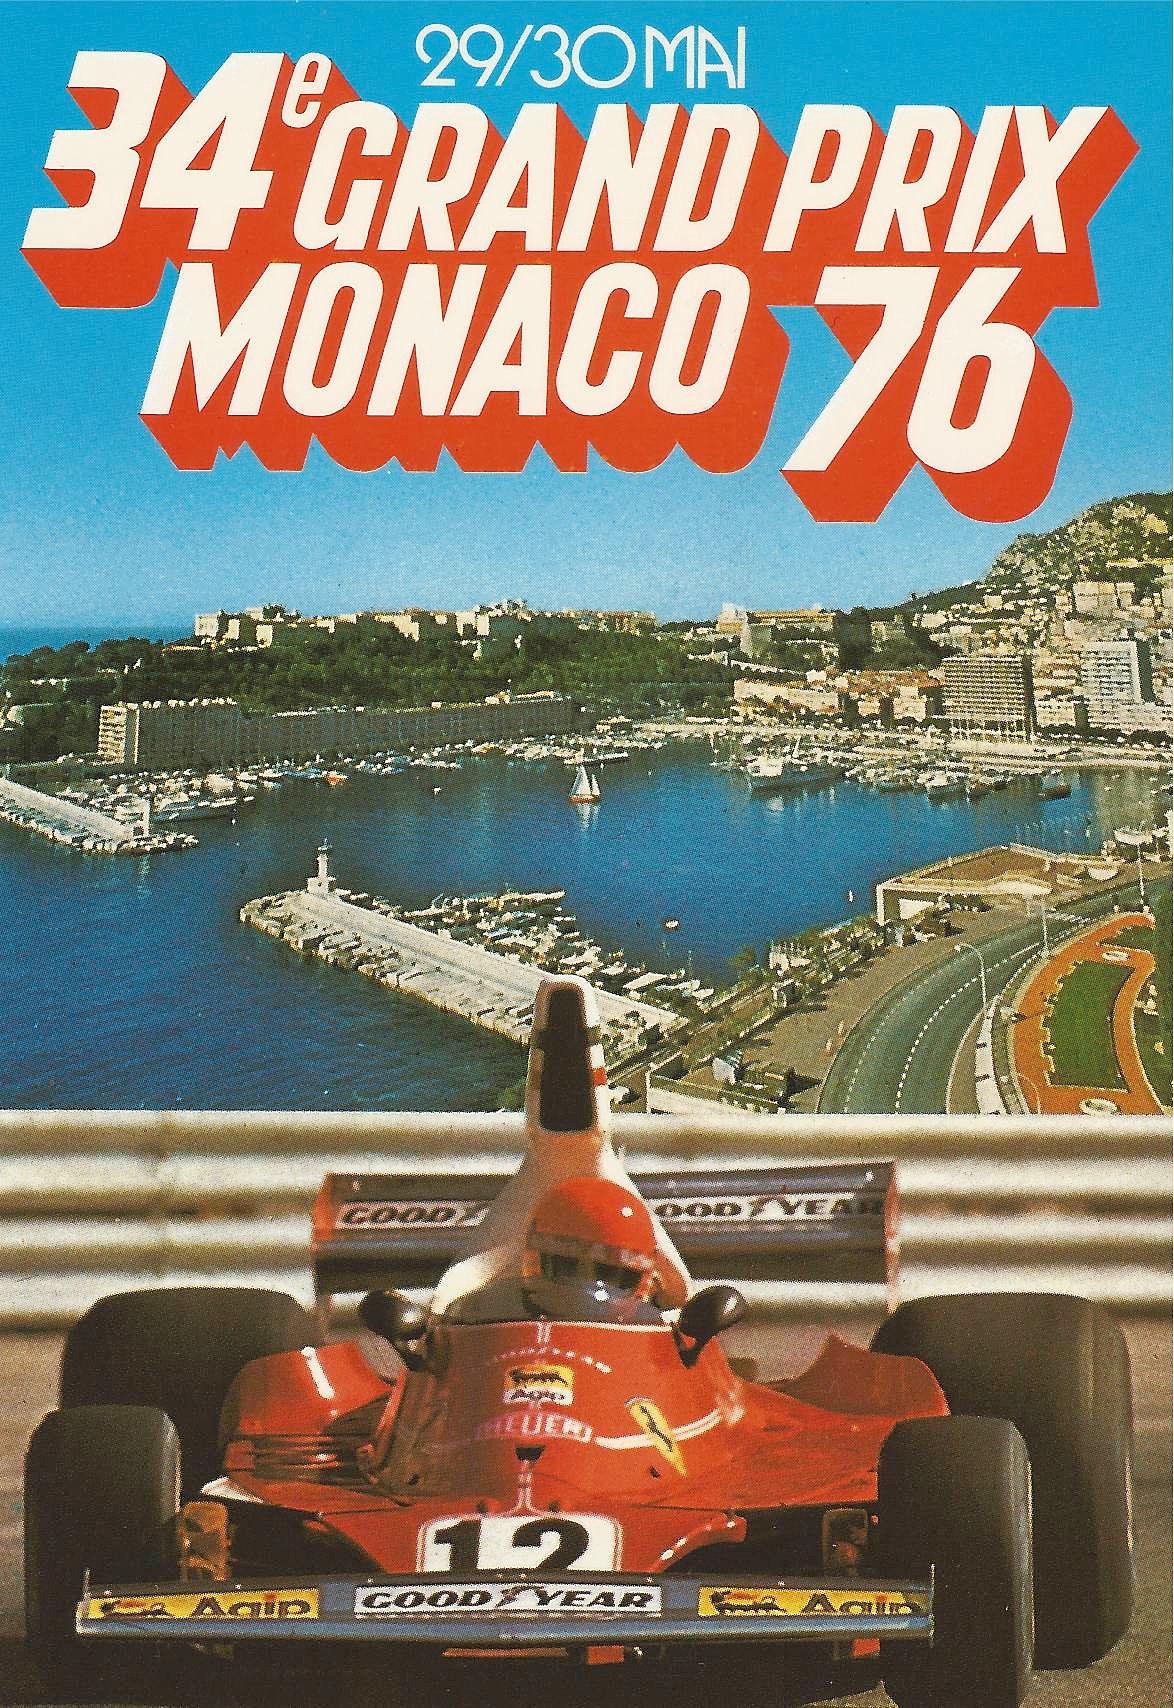 Association Cartophile de Monaco   Grand Prix Monaco ...: http://www.cartophiles-monaco.com/#!grand-prix-monaco-formule-1---1976/zoom/c1pjk/image1n66